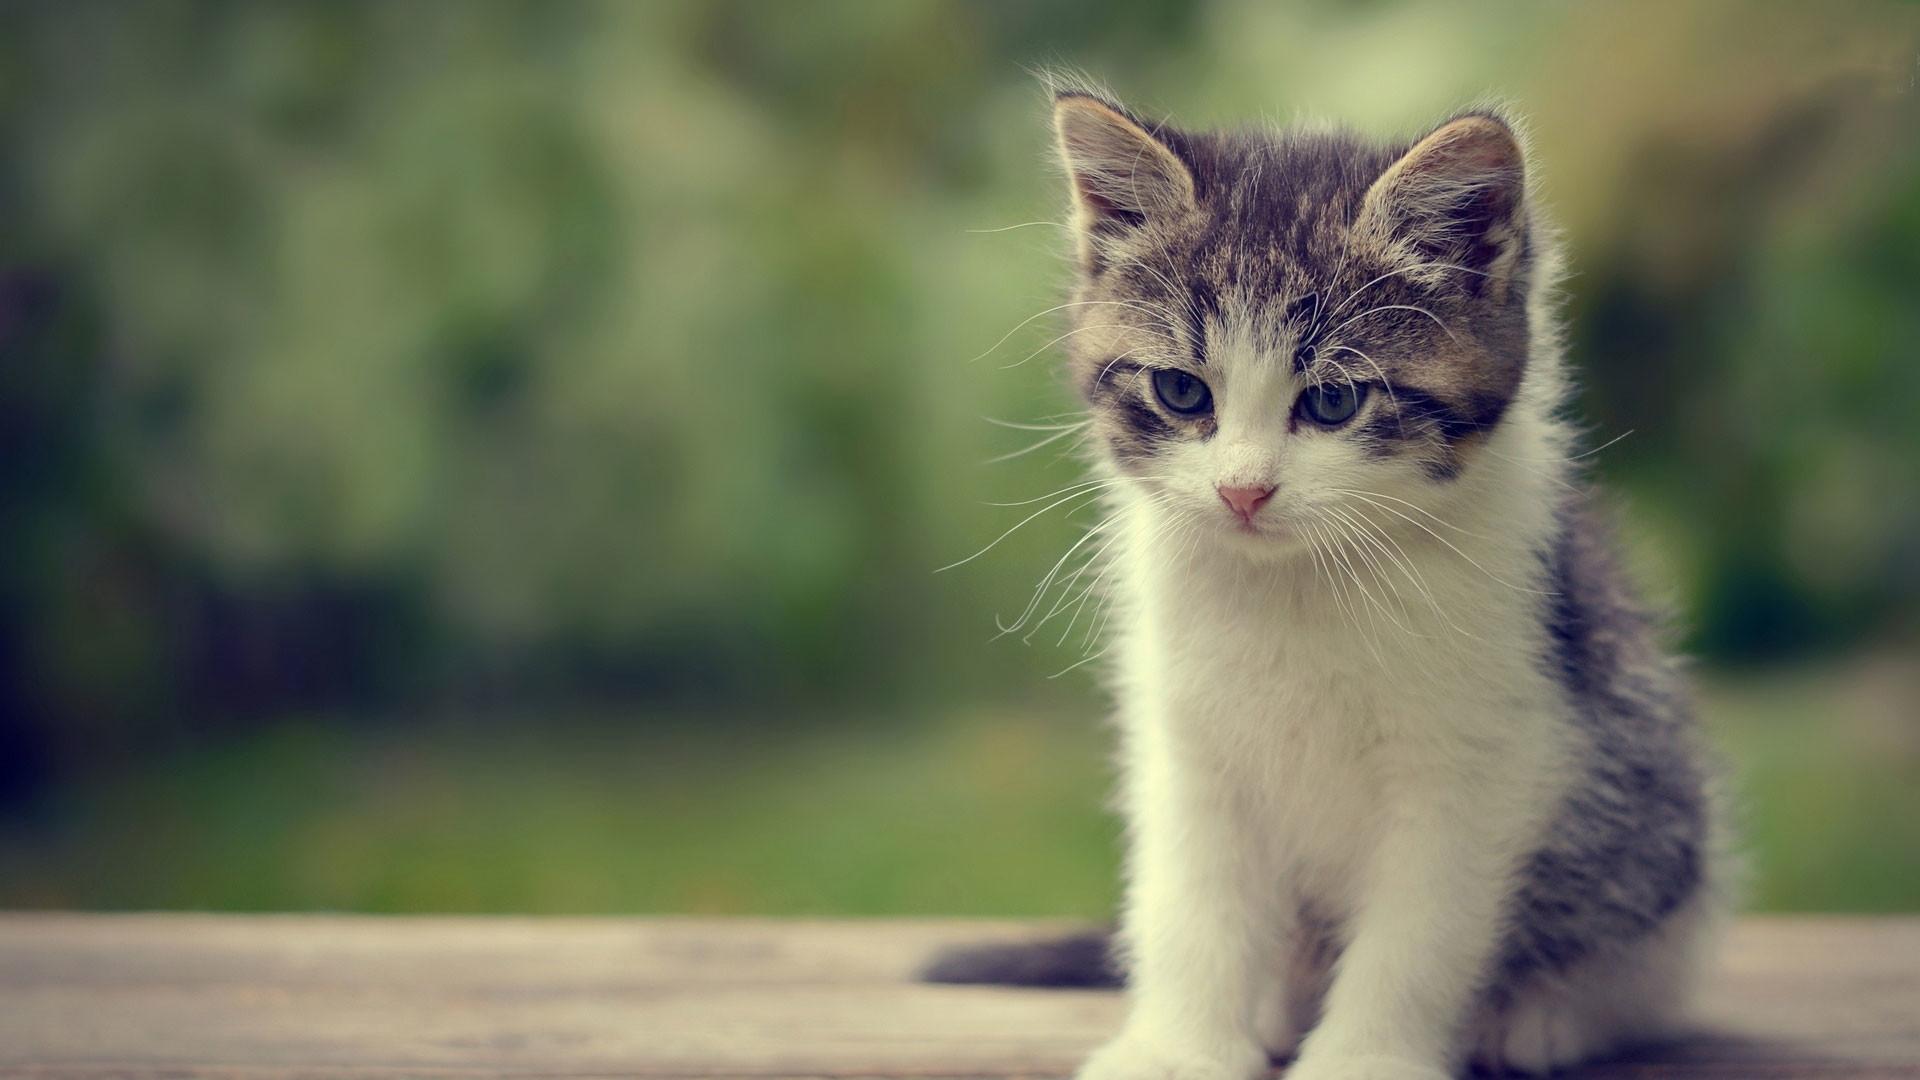 hd pics photos cute cat attractive kitten nice beautiful hd quality desktop  background wallpaper